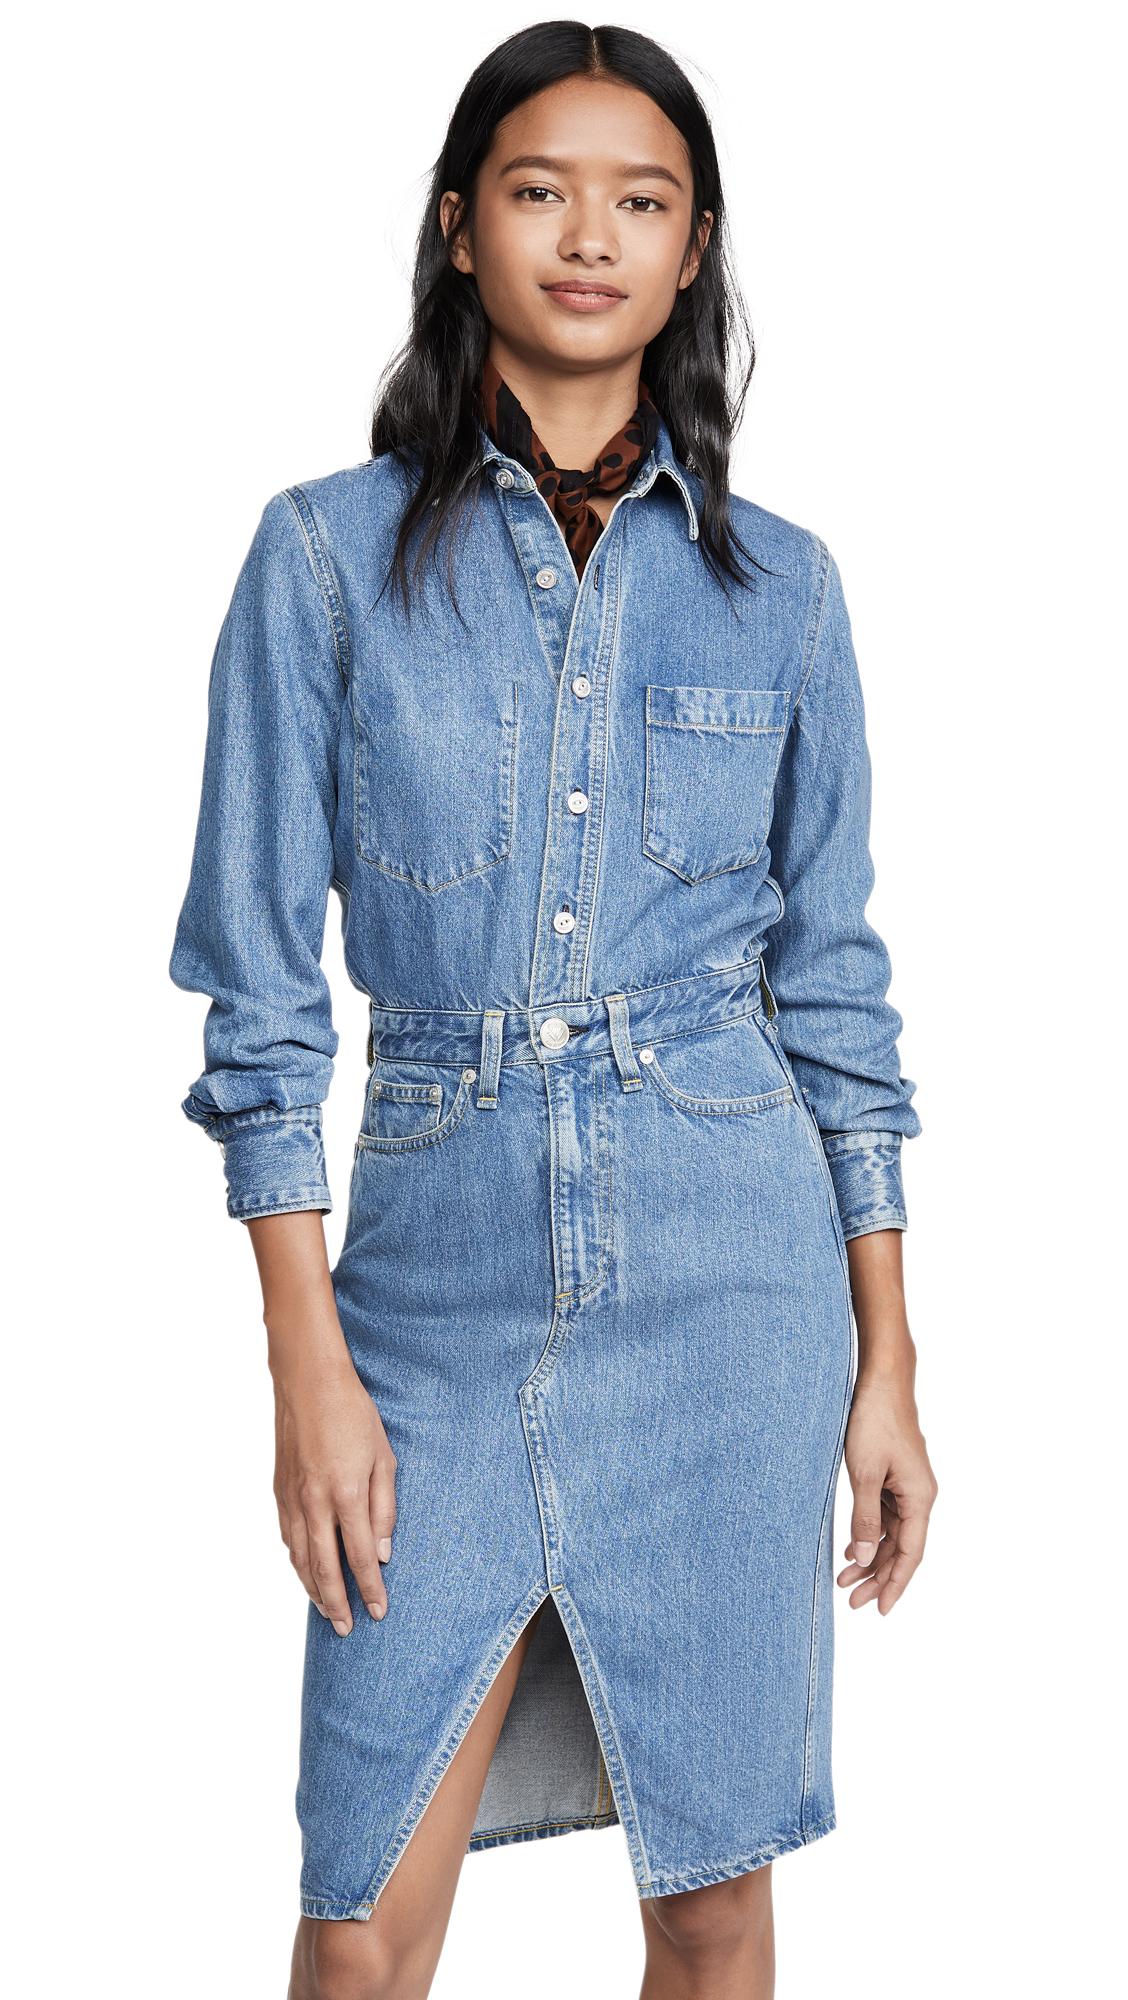 Buy Rag & Bone/JEAN All In One Dress online beautiful Rag & Bone/JEAN Clothing, Dresses